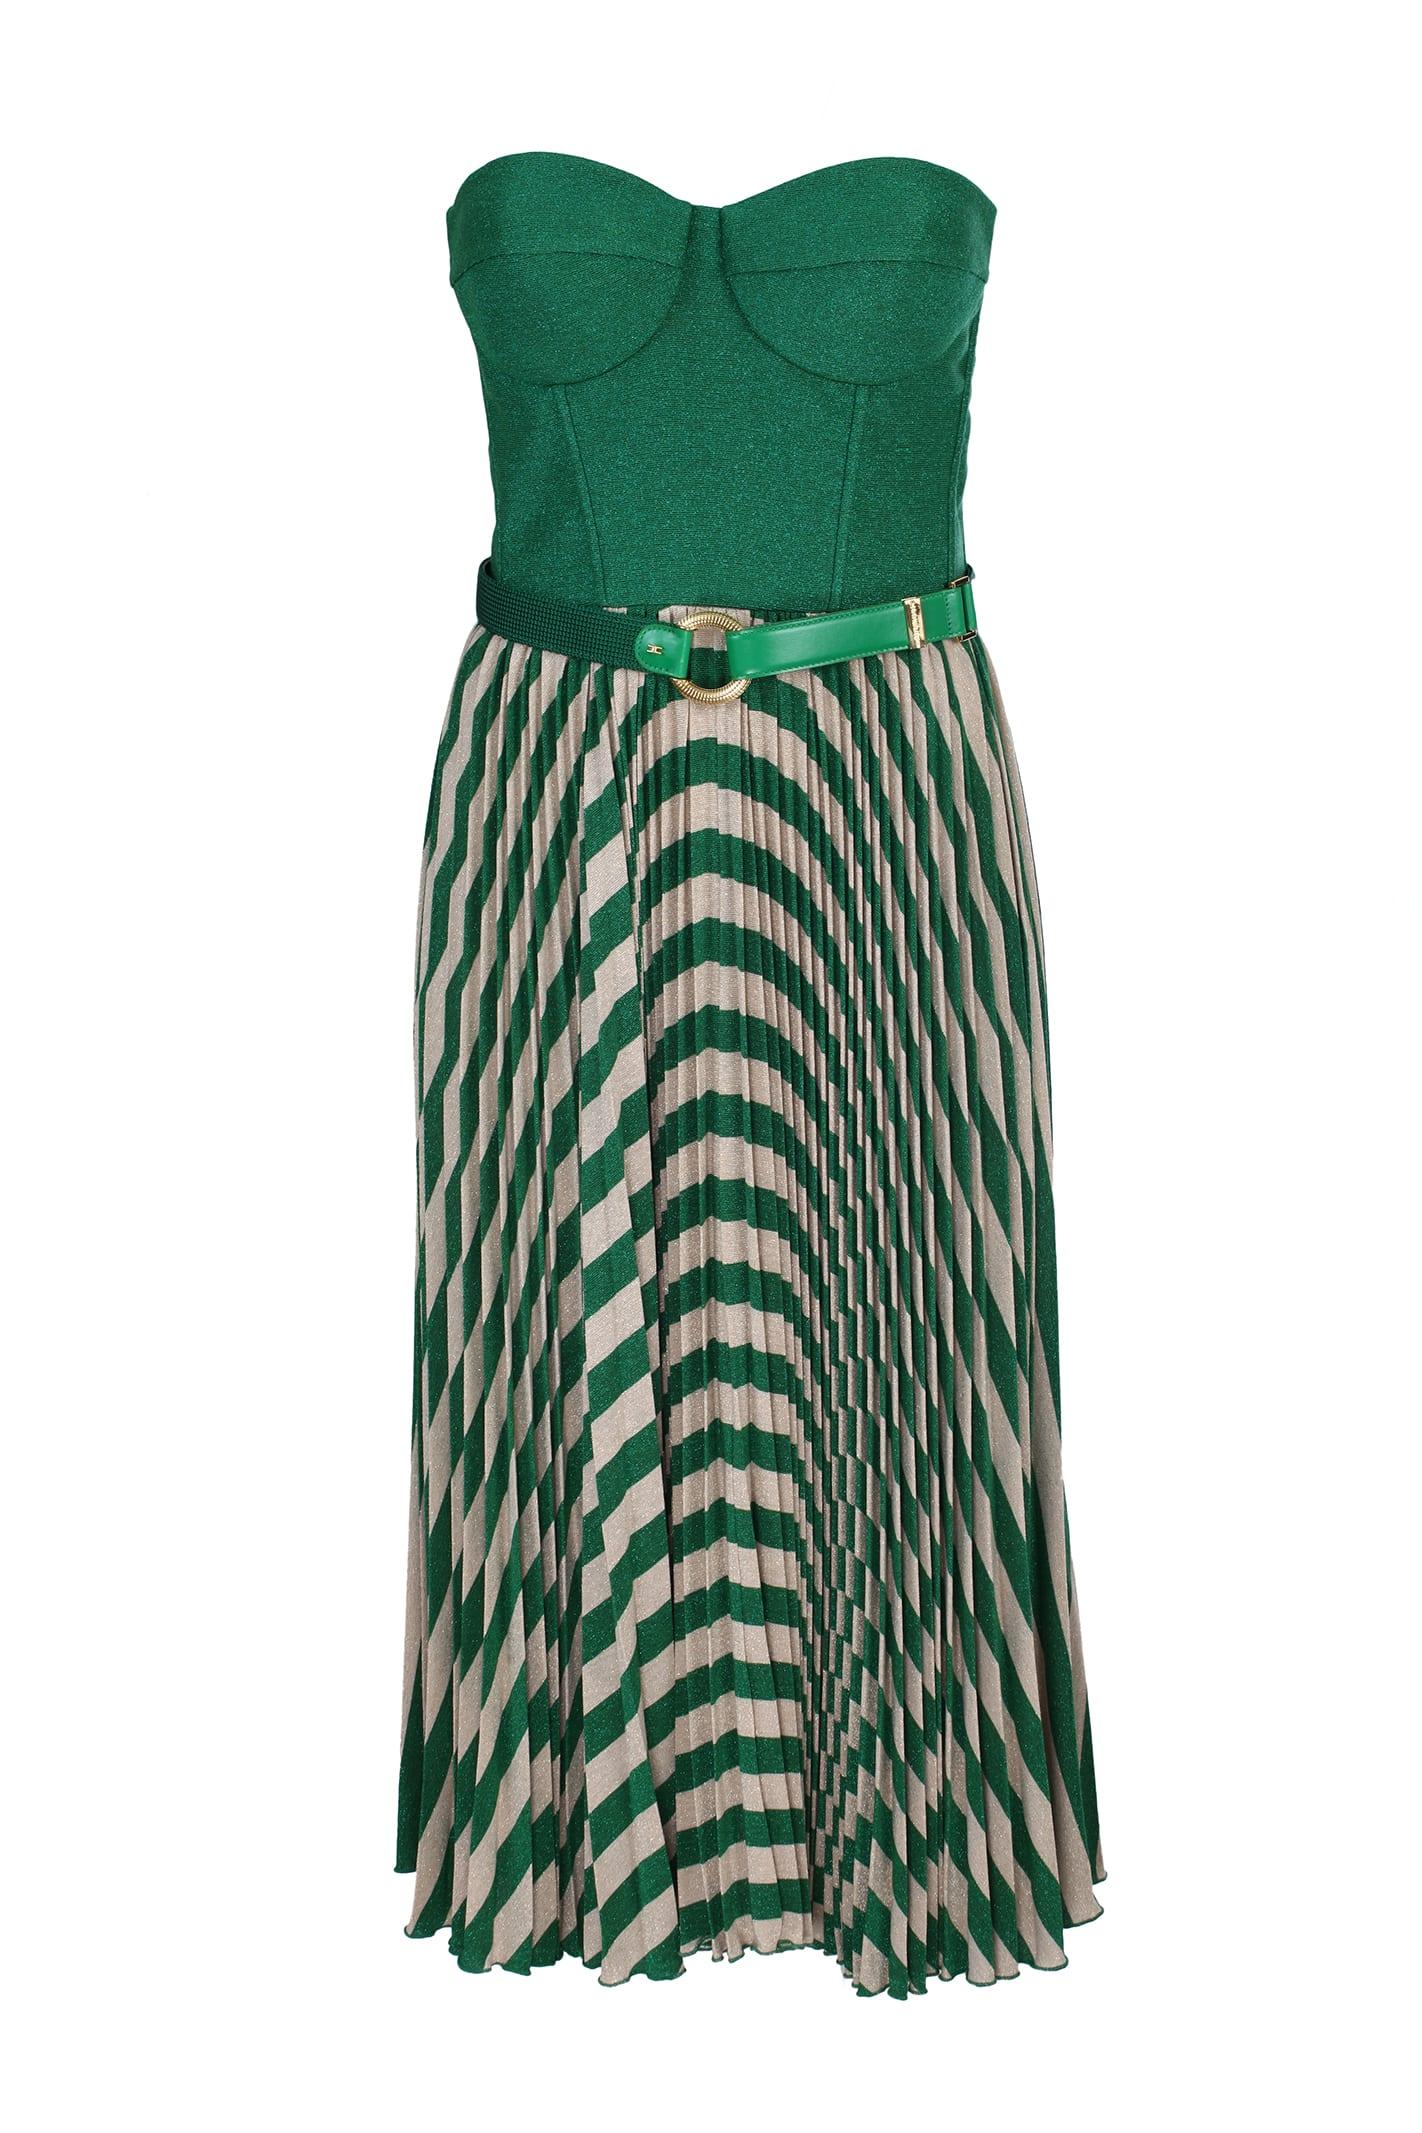 Buy Elisabetta Franchi Celyn B. Elisabetta Franchi Sleeveless Dress online, shop Elisabetta Franchi Celyn B. with free shipping